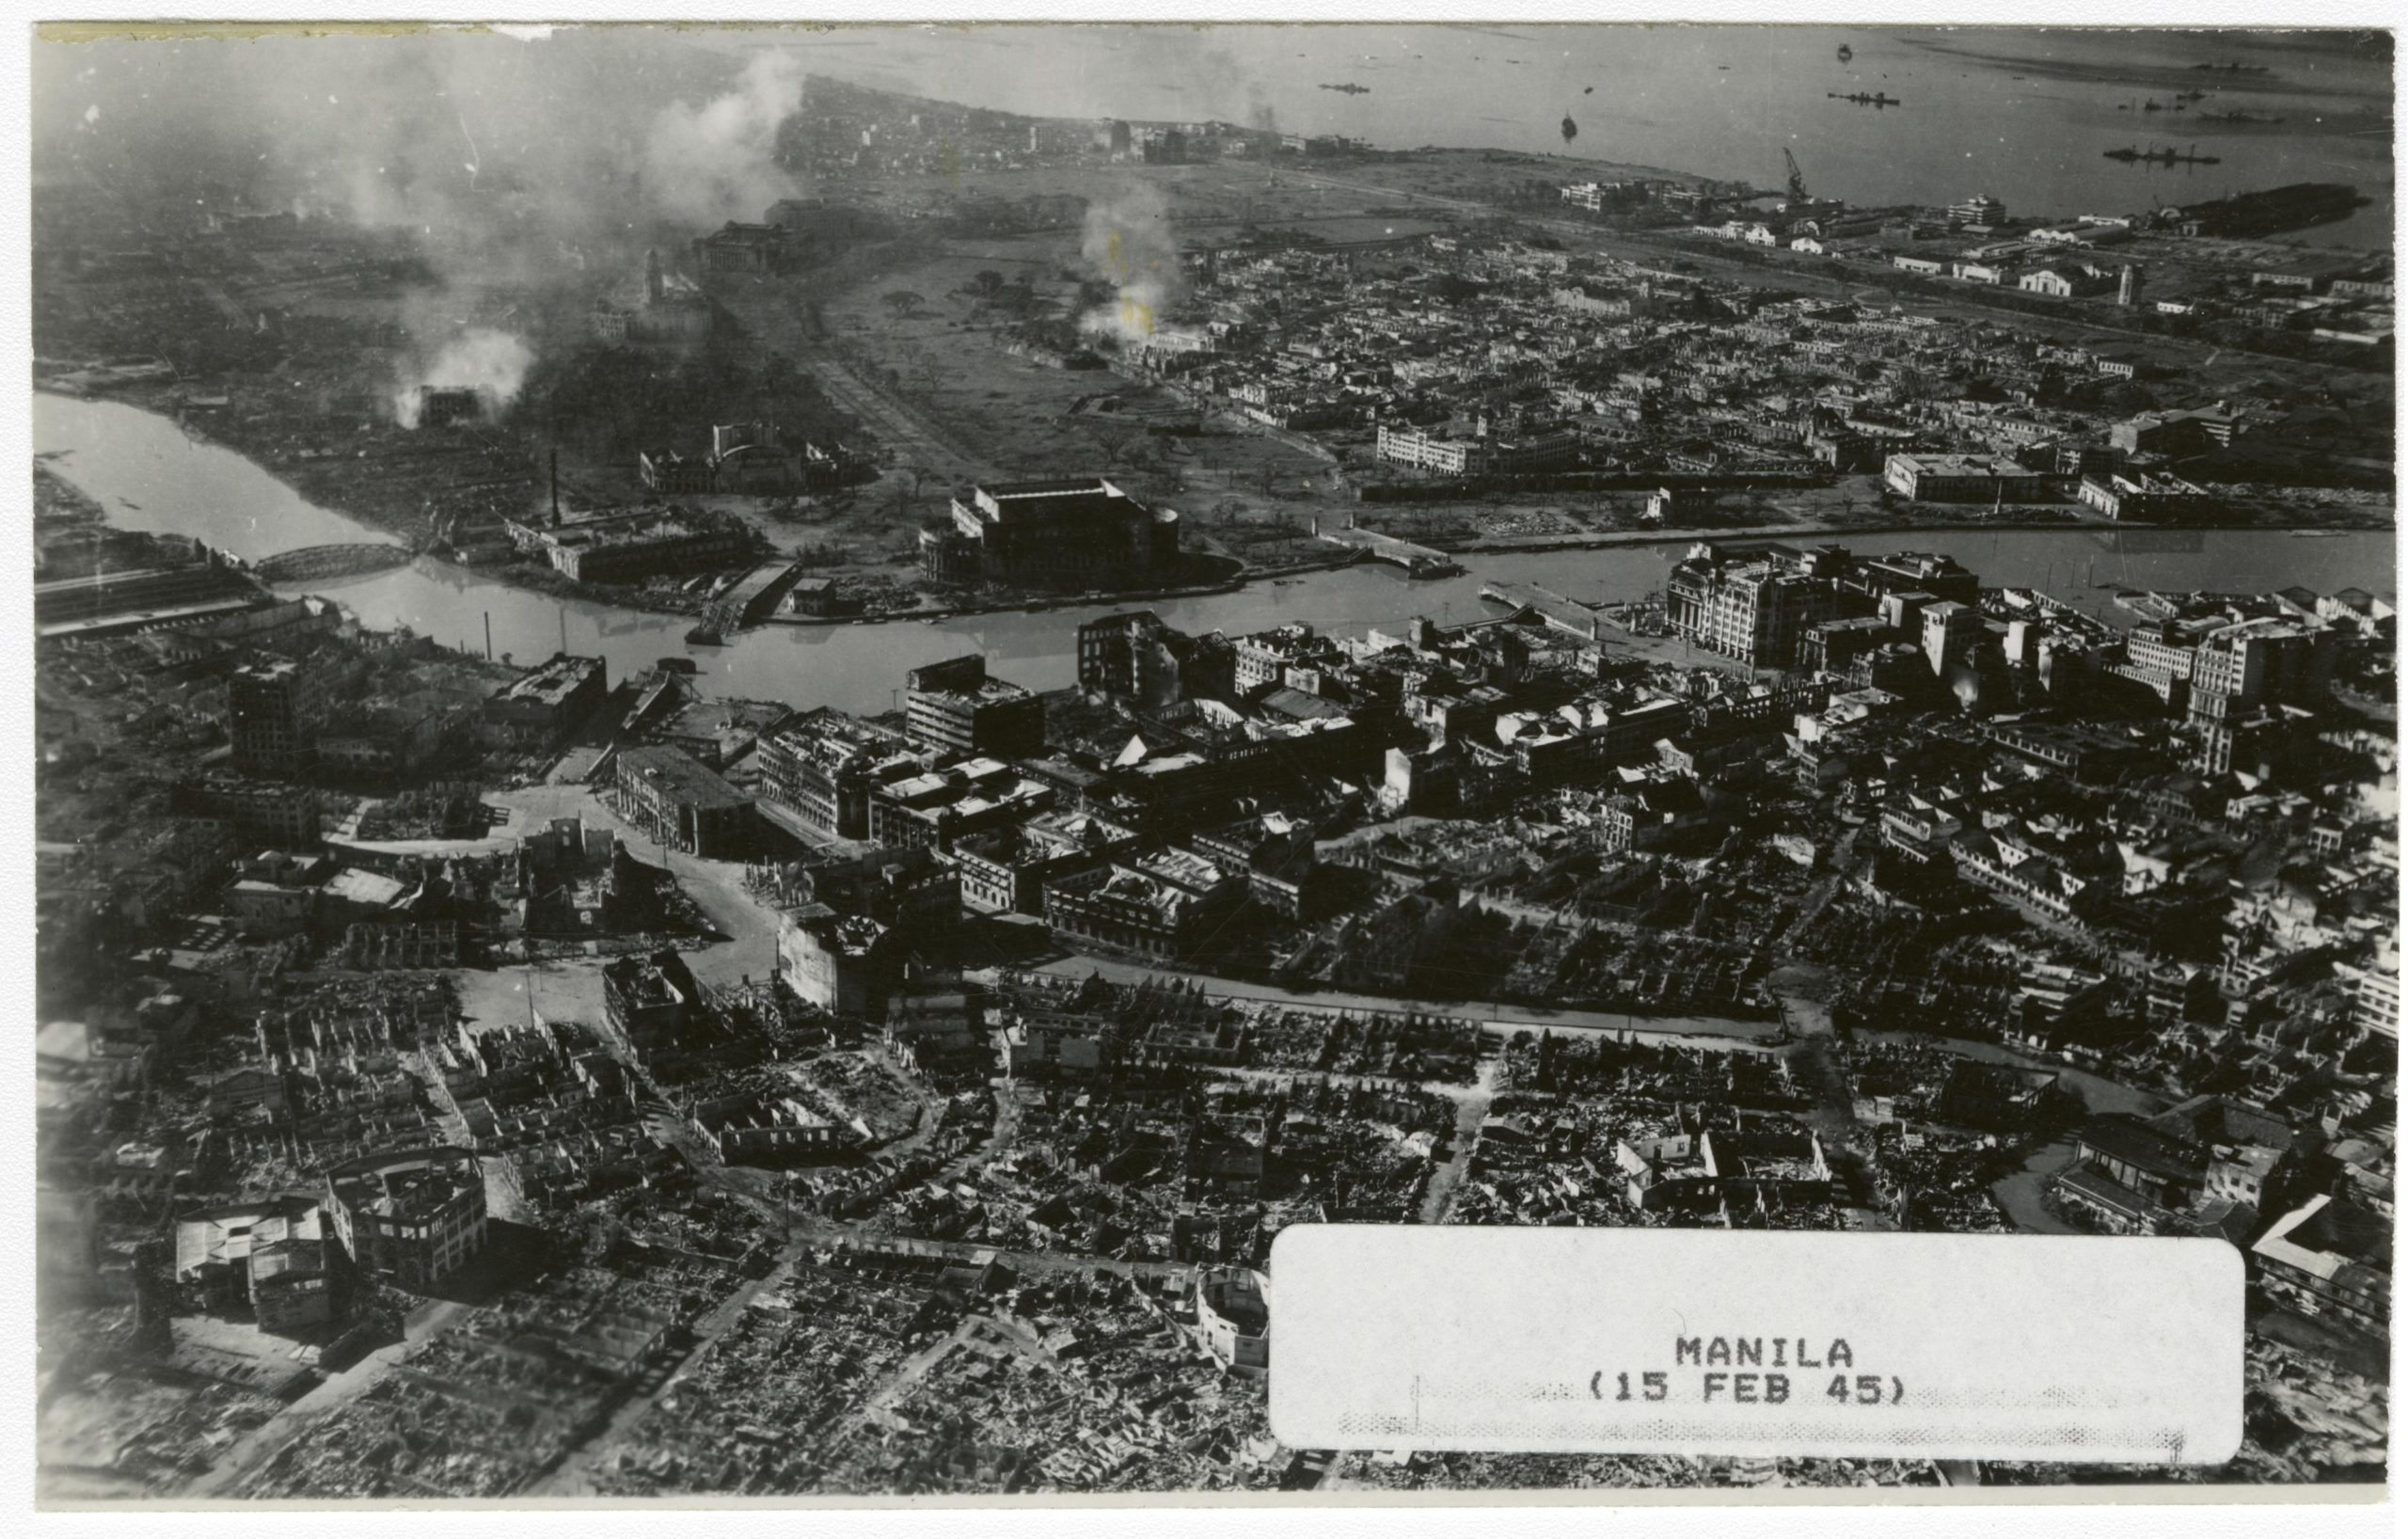 Manila destroyed in WWII due to urban warfare